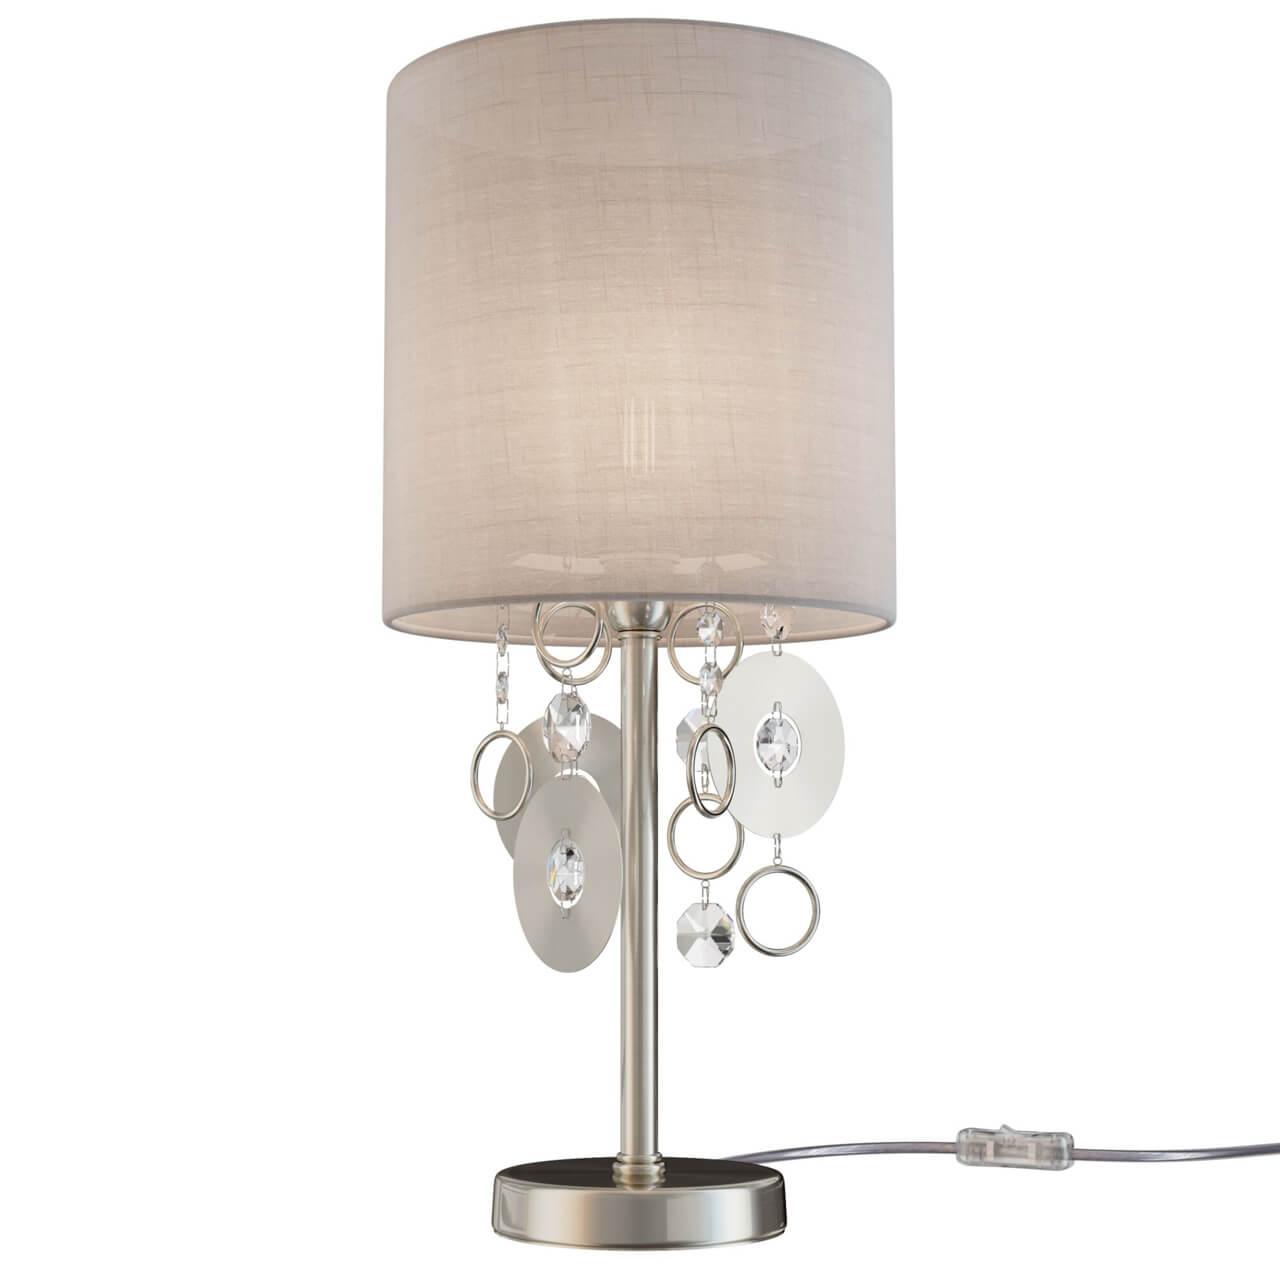 Настольная лампа Maytoni MOD075TL-01N Kira